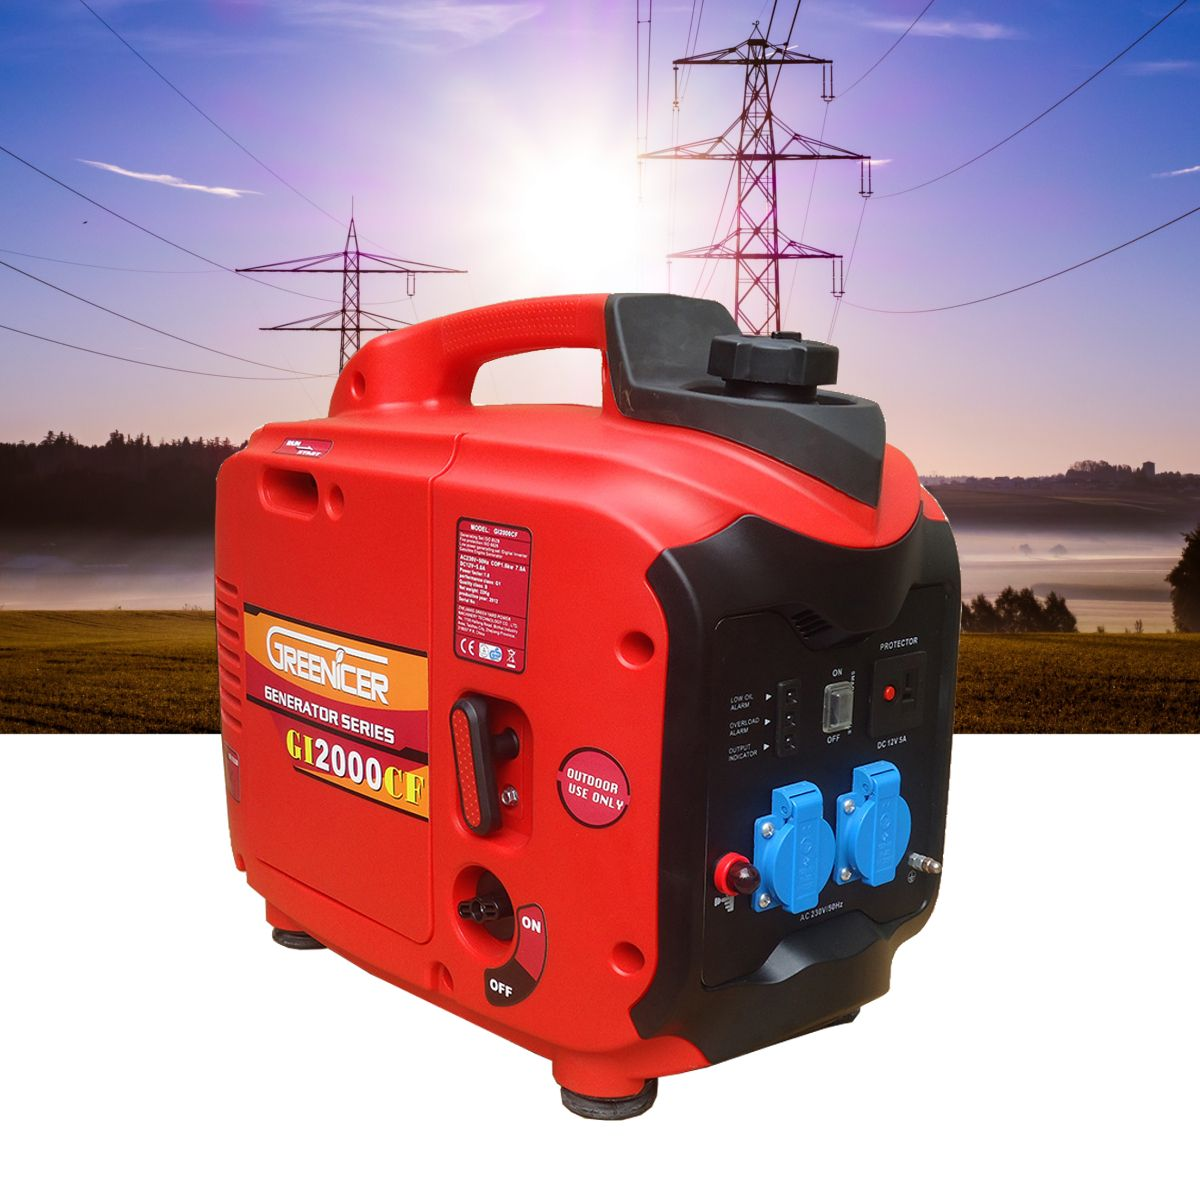 1/2/3KW 220V Portable Electric DC/AC Inverter Generator Digital Gasoline Powered Engine Generator Set Ture Power Low fuel